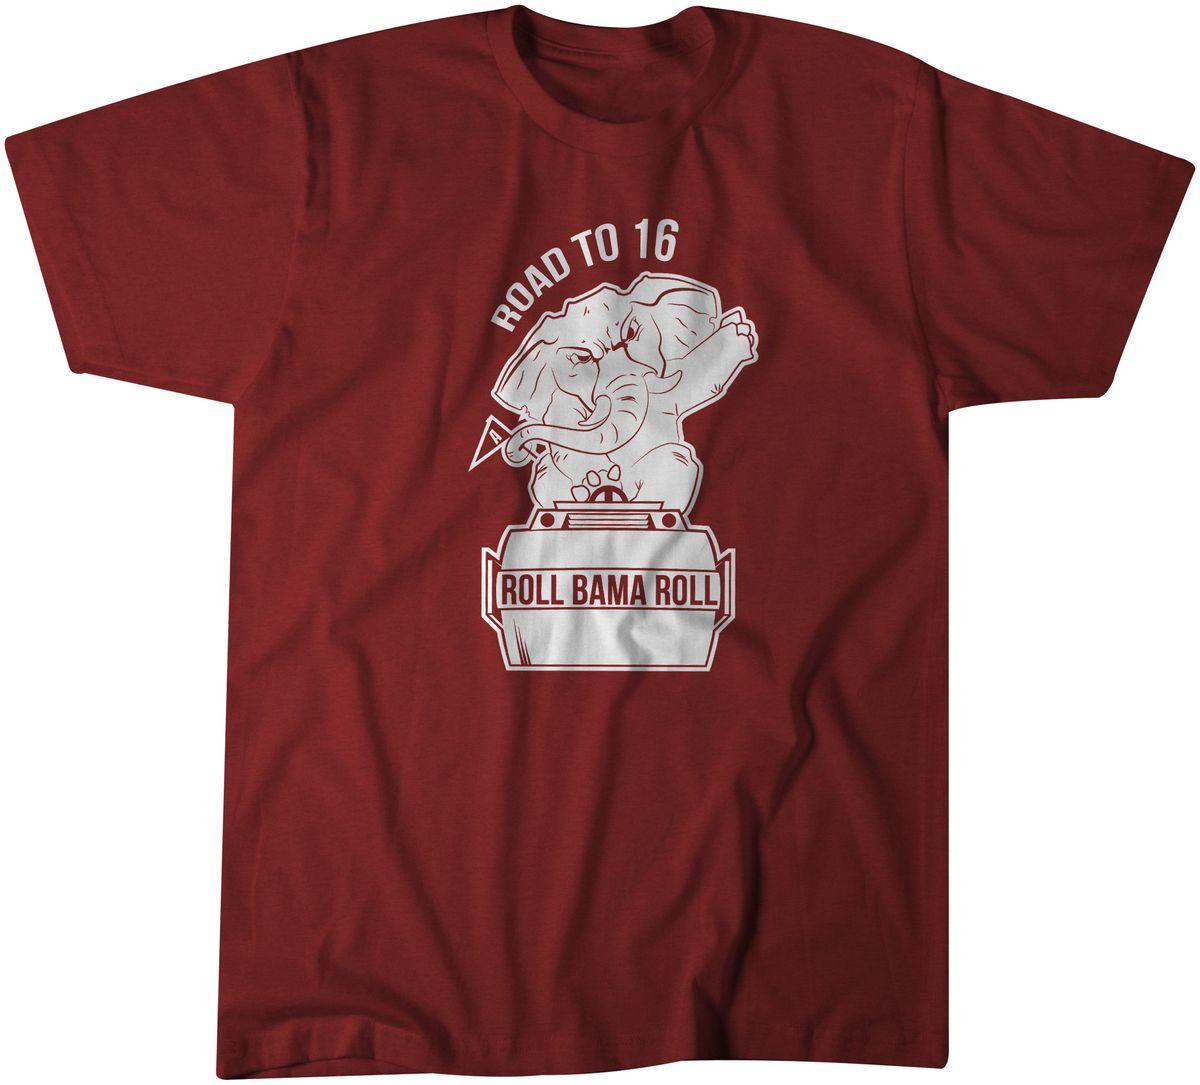 Roadto16 national championship t shirts are here roll Alabama sec championship shirt